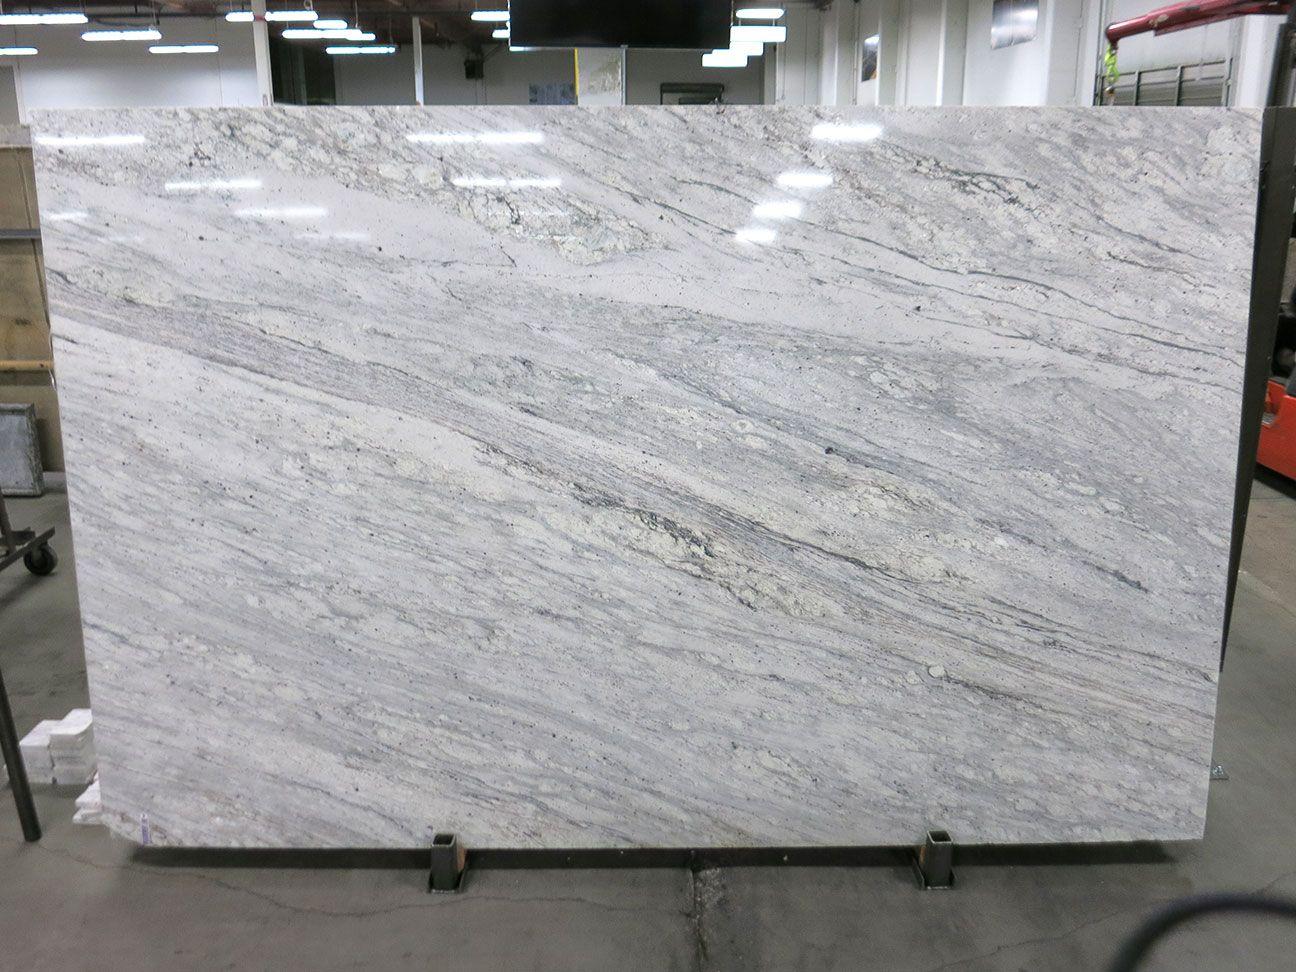 Glacier White Polished Block 012722 Granite Countertops Kitchen White Granite Countertops Countertops